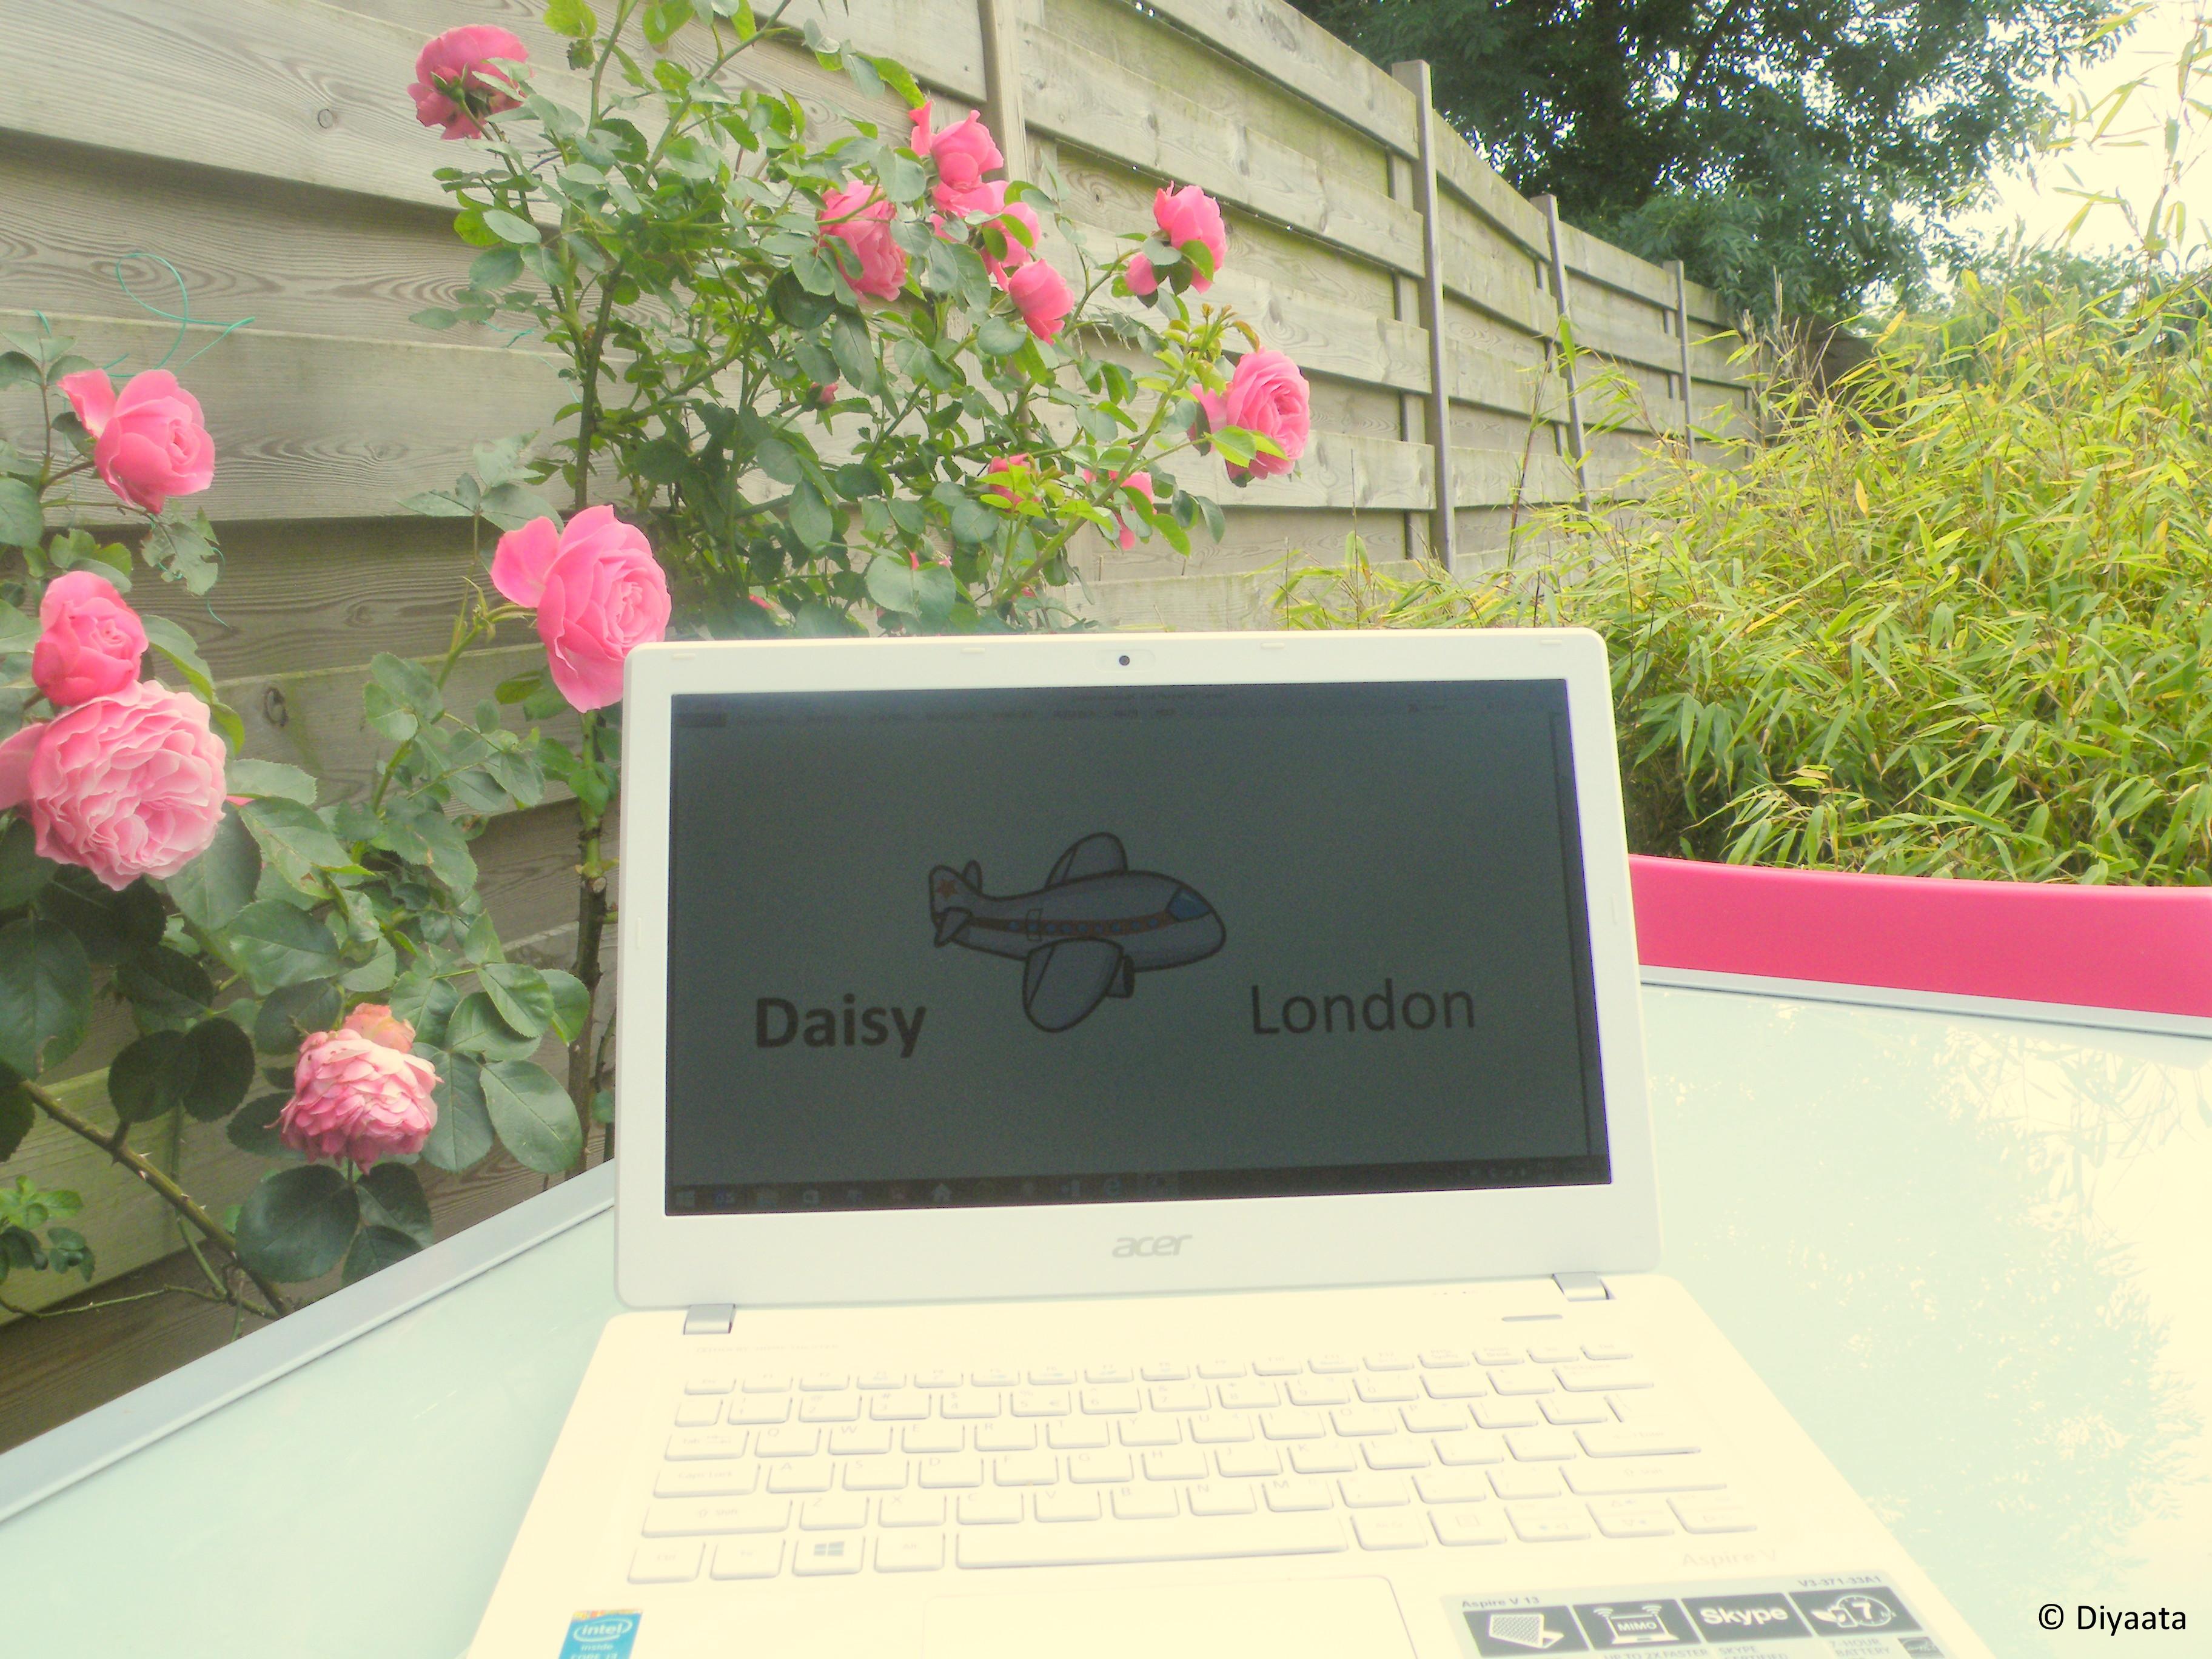 London - planning